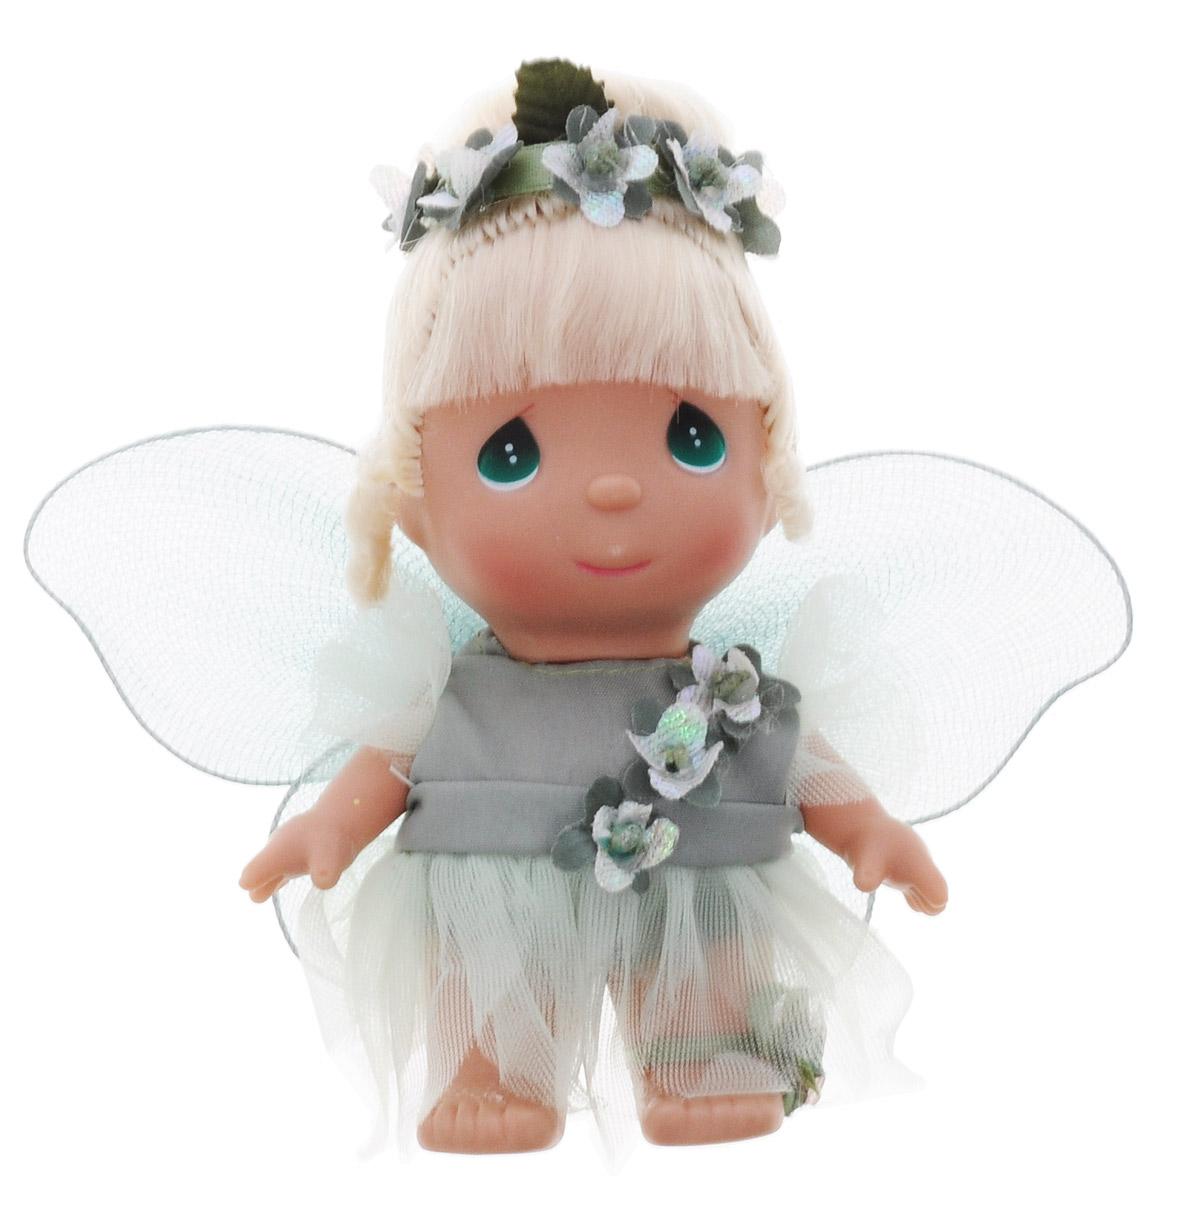 Precious Moments Мини-кукла Фея цвет наряда зеленый precious moments мини кукла колокольчик